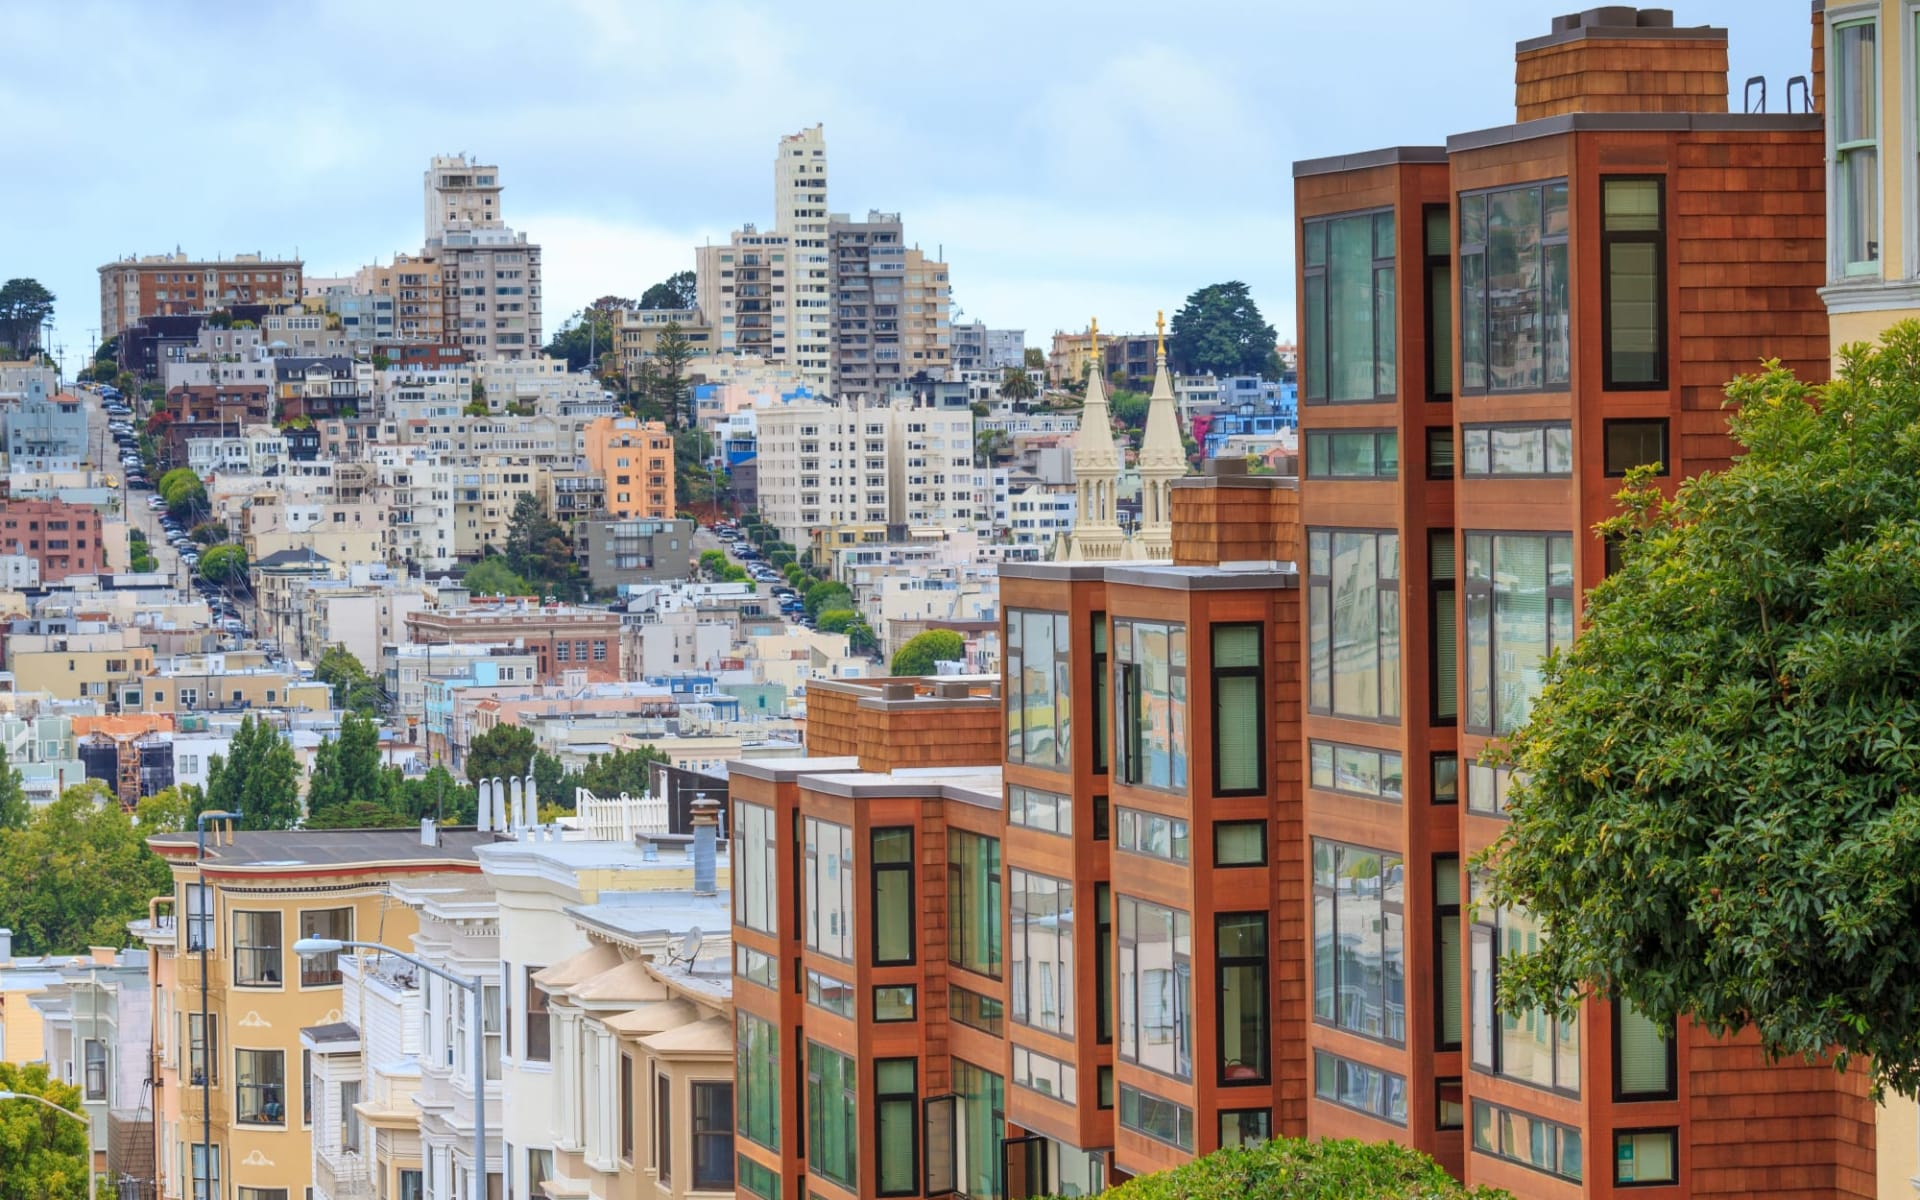 Sir Francis Drake Hotel in San Francisco: shutterstock_154884305_sanfran4